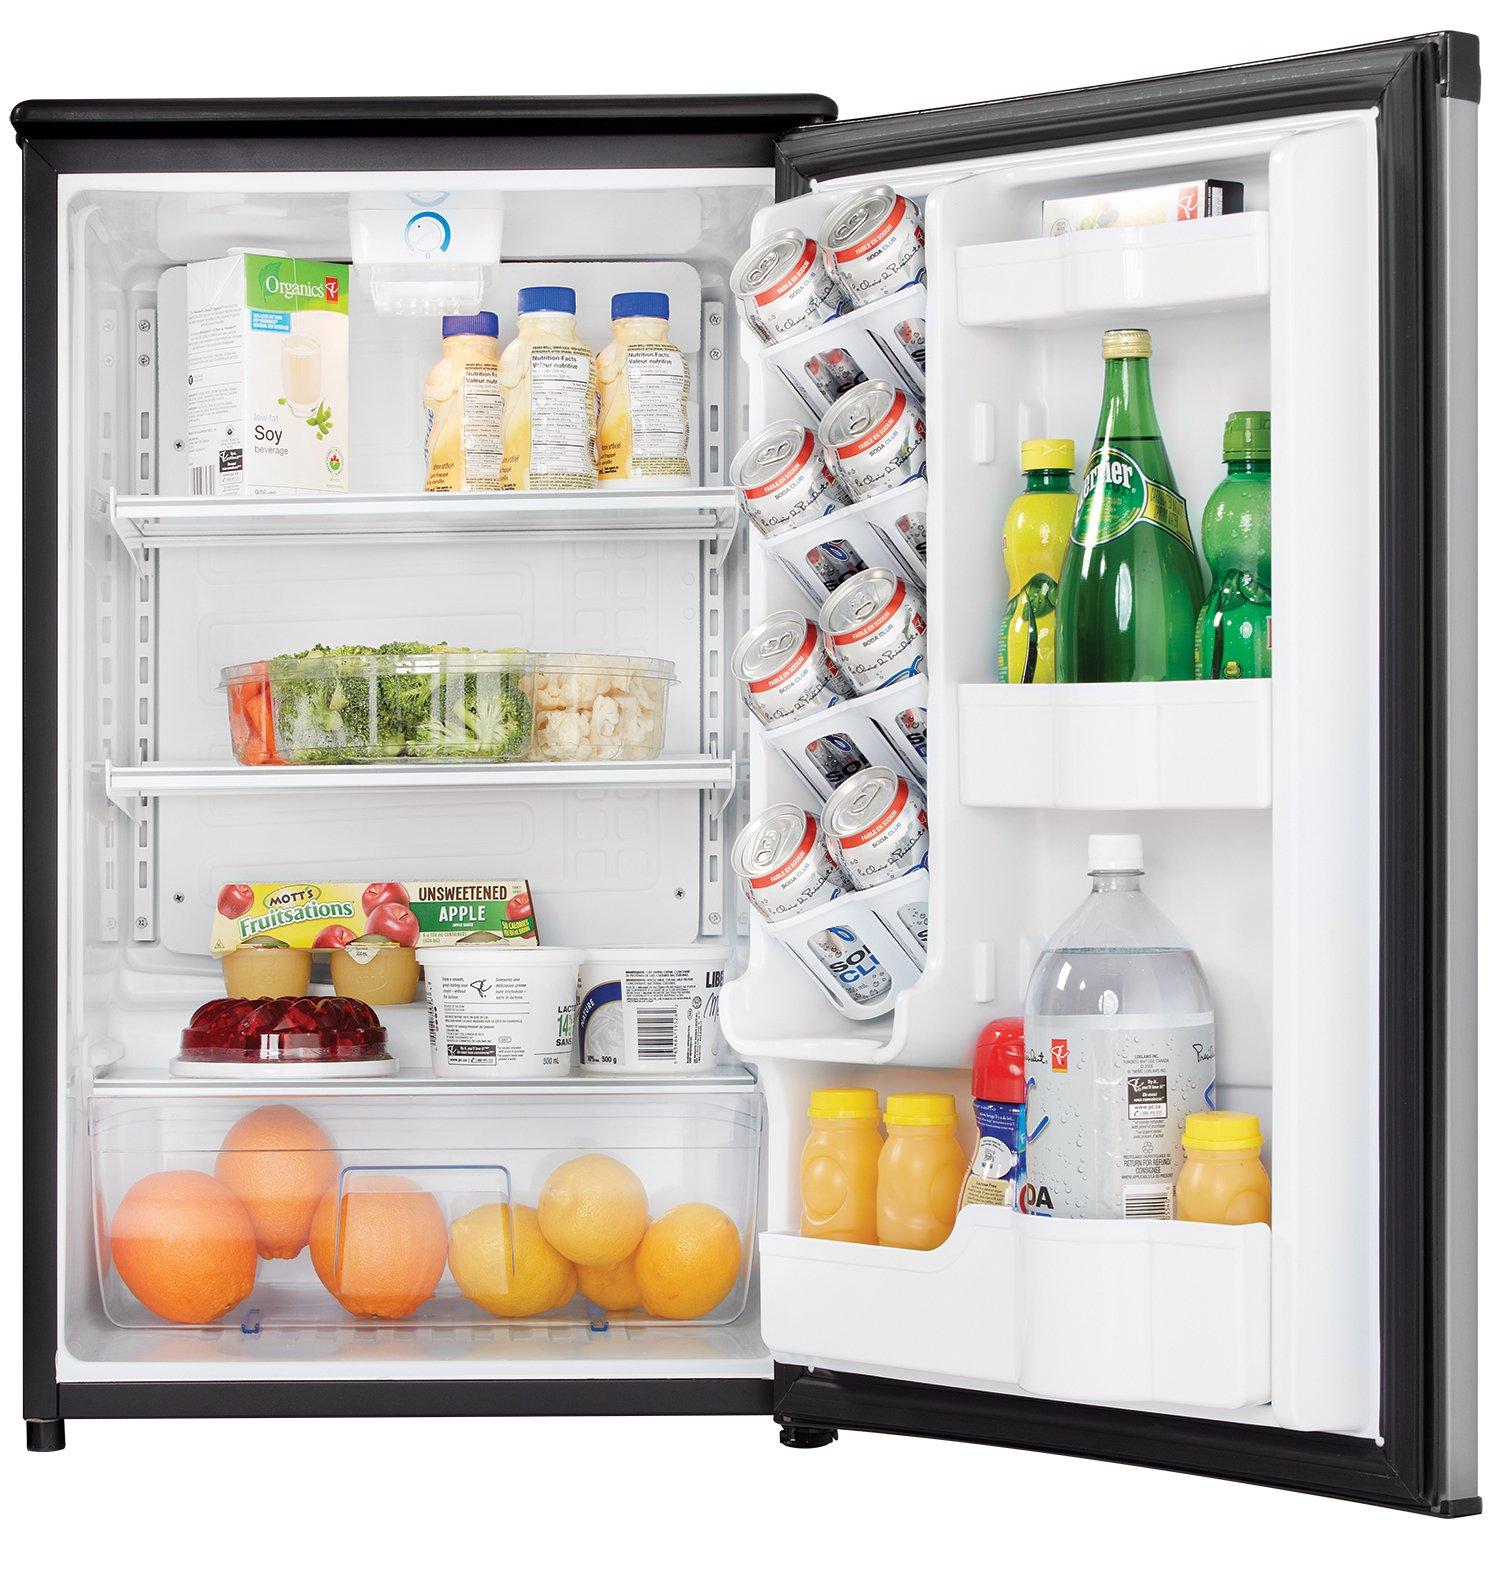 Danby DAR044A5BSLDD Compact Refrigerator, Spotless Steel Door, 4.4 Cubic Feet by Danby (Image #3)